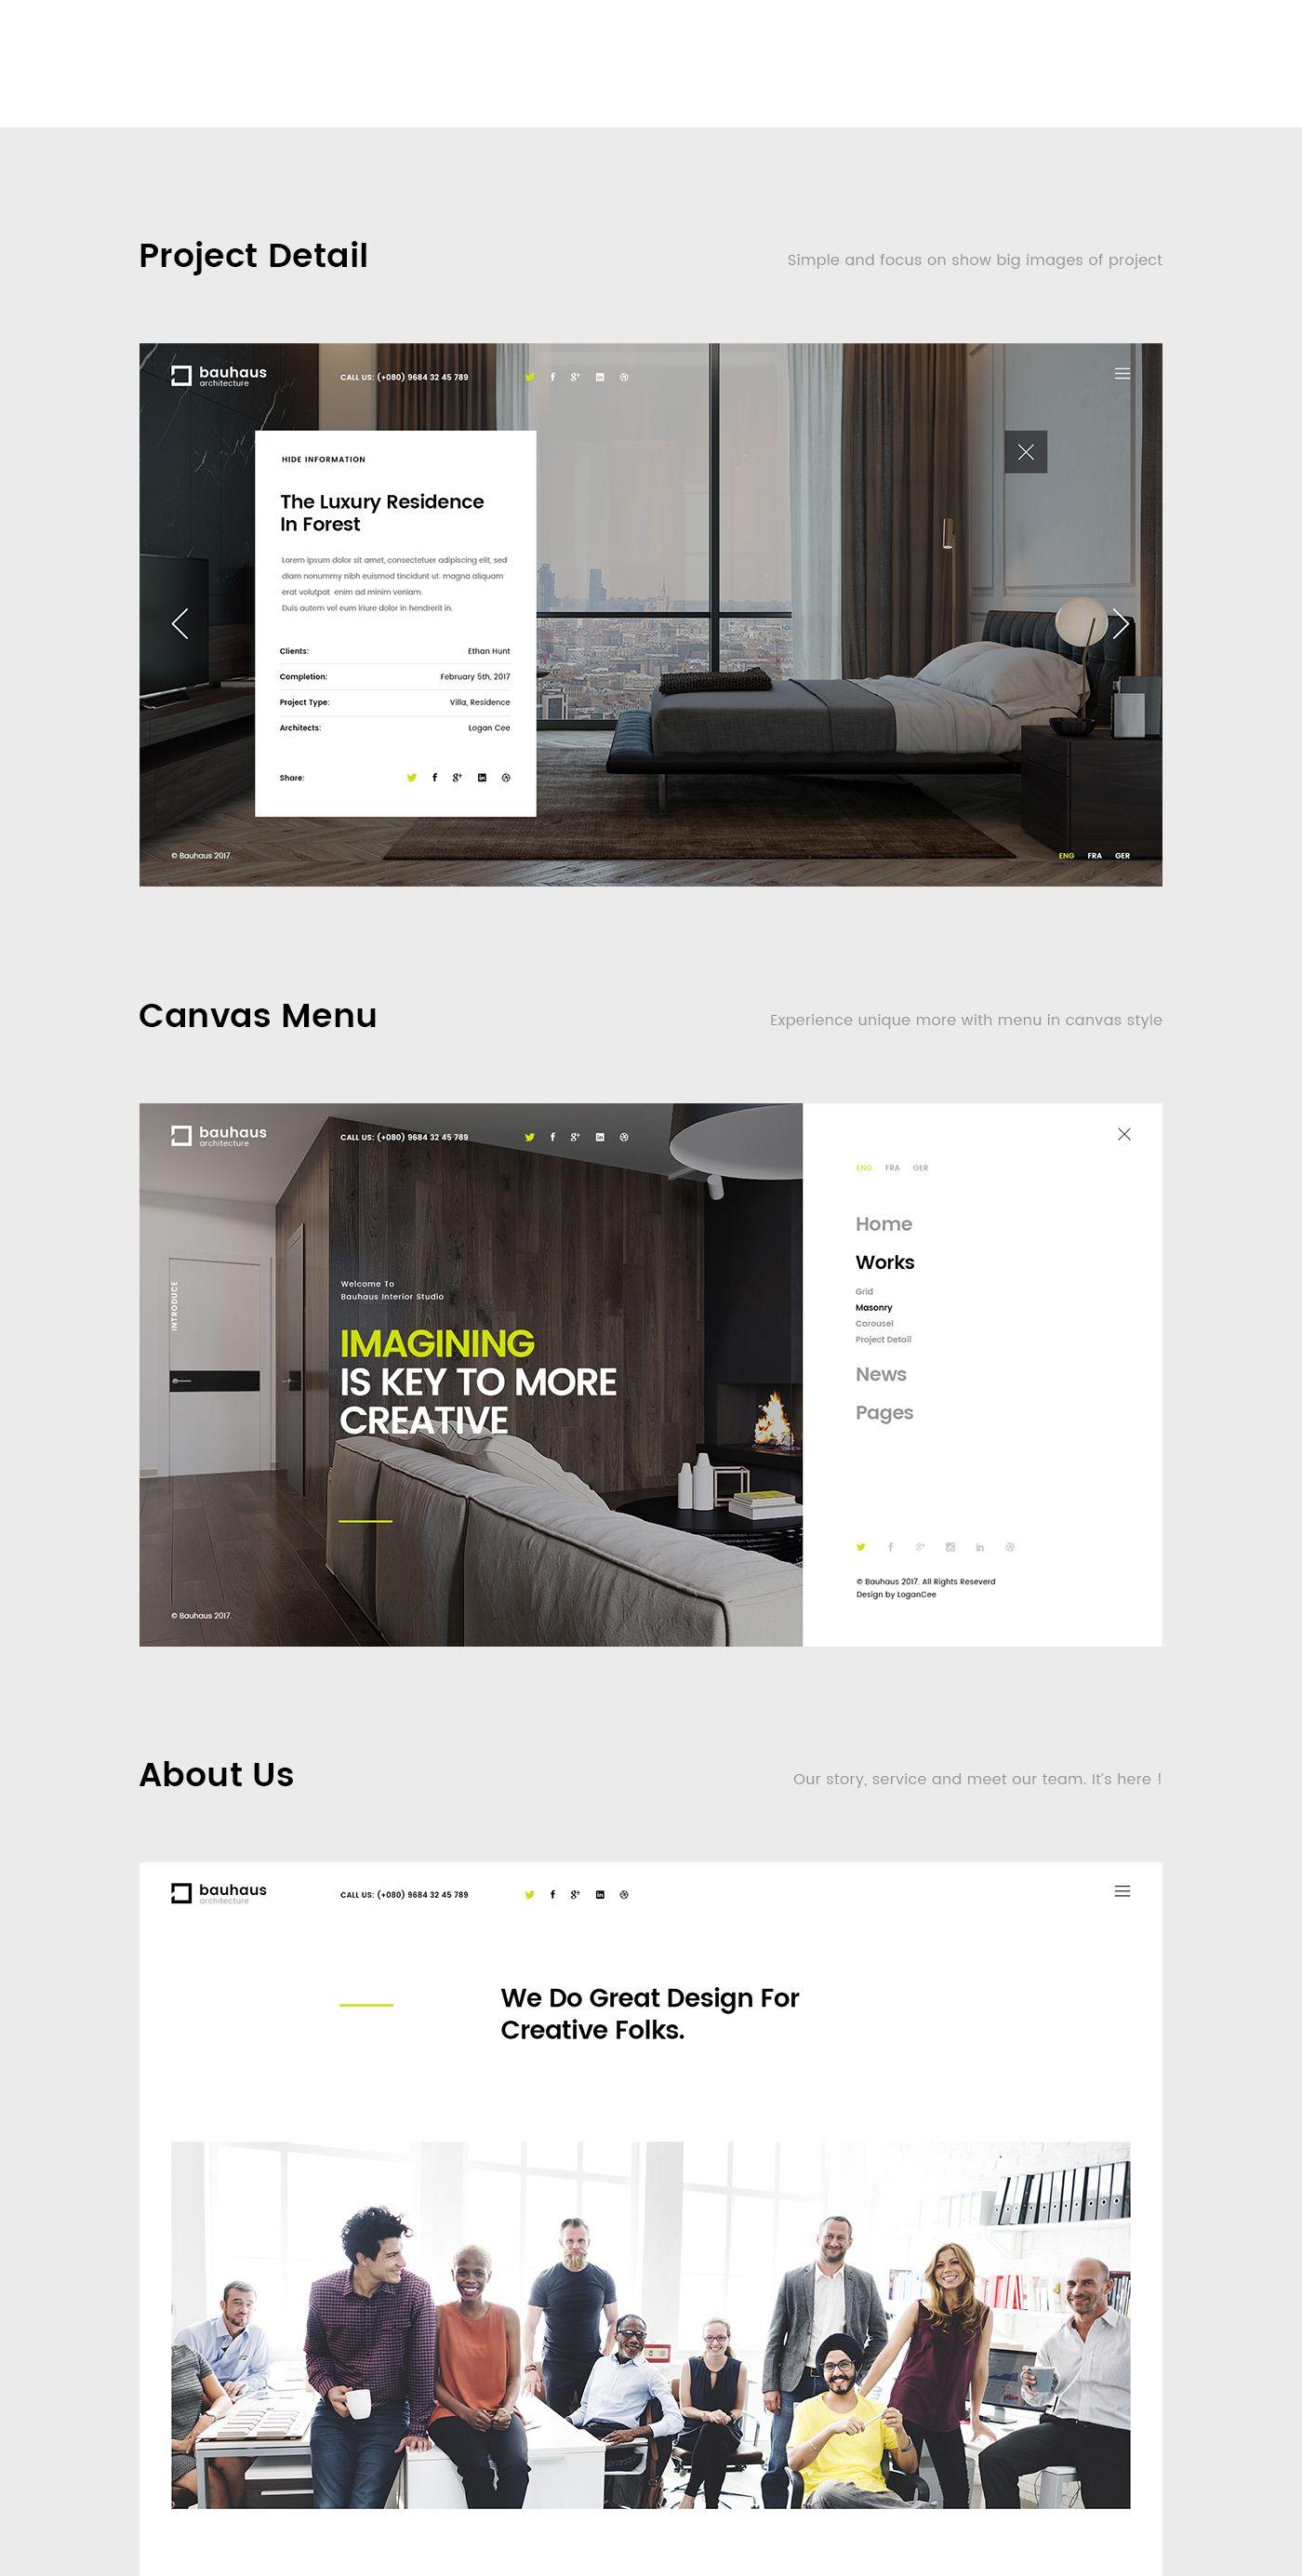 Bauhaus Architecture Studio Website On Behance Bauhaus Architecture Architecture Visualization Bauhaus